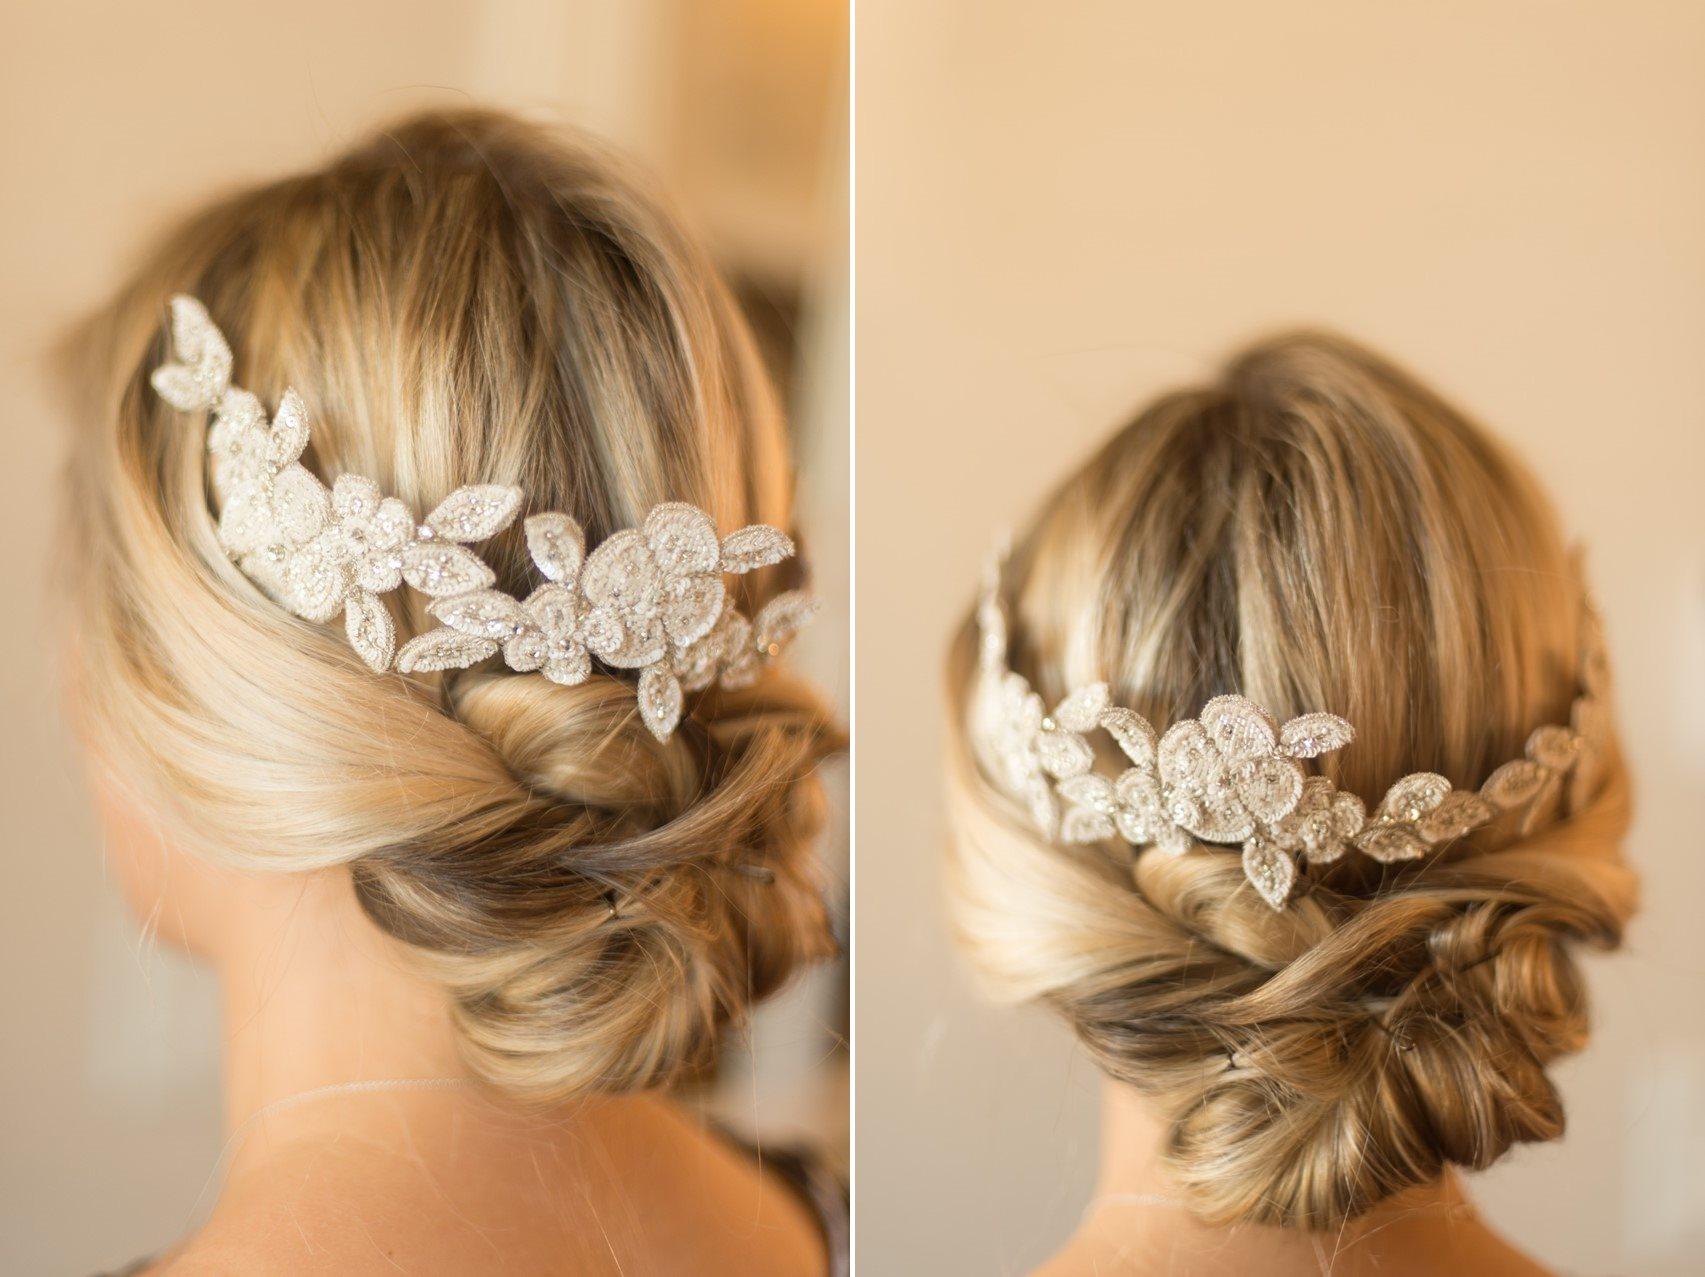 20-Emmy-London-Bridal-Hair-Accessories.jpg